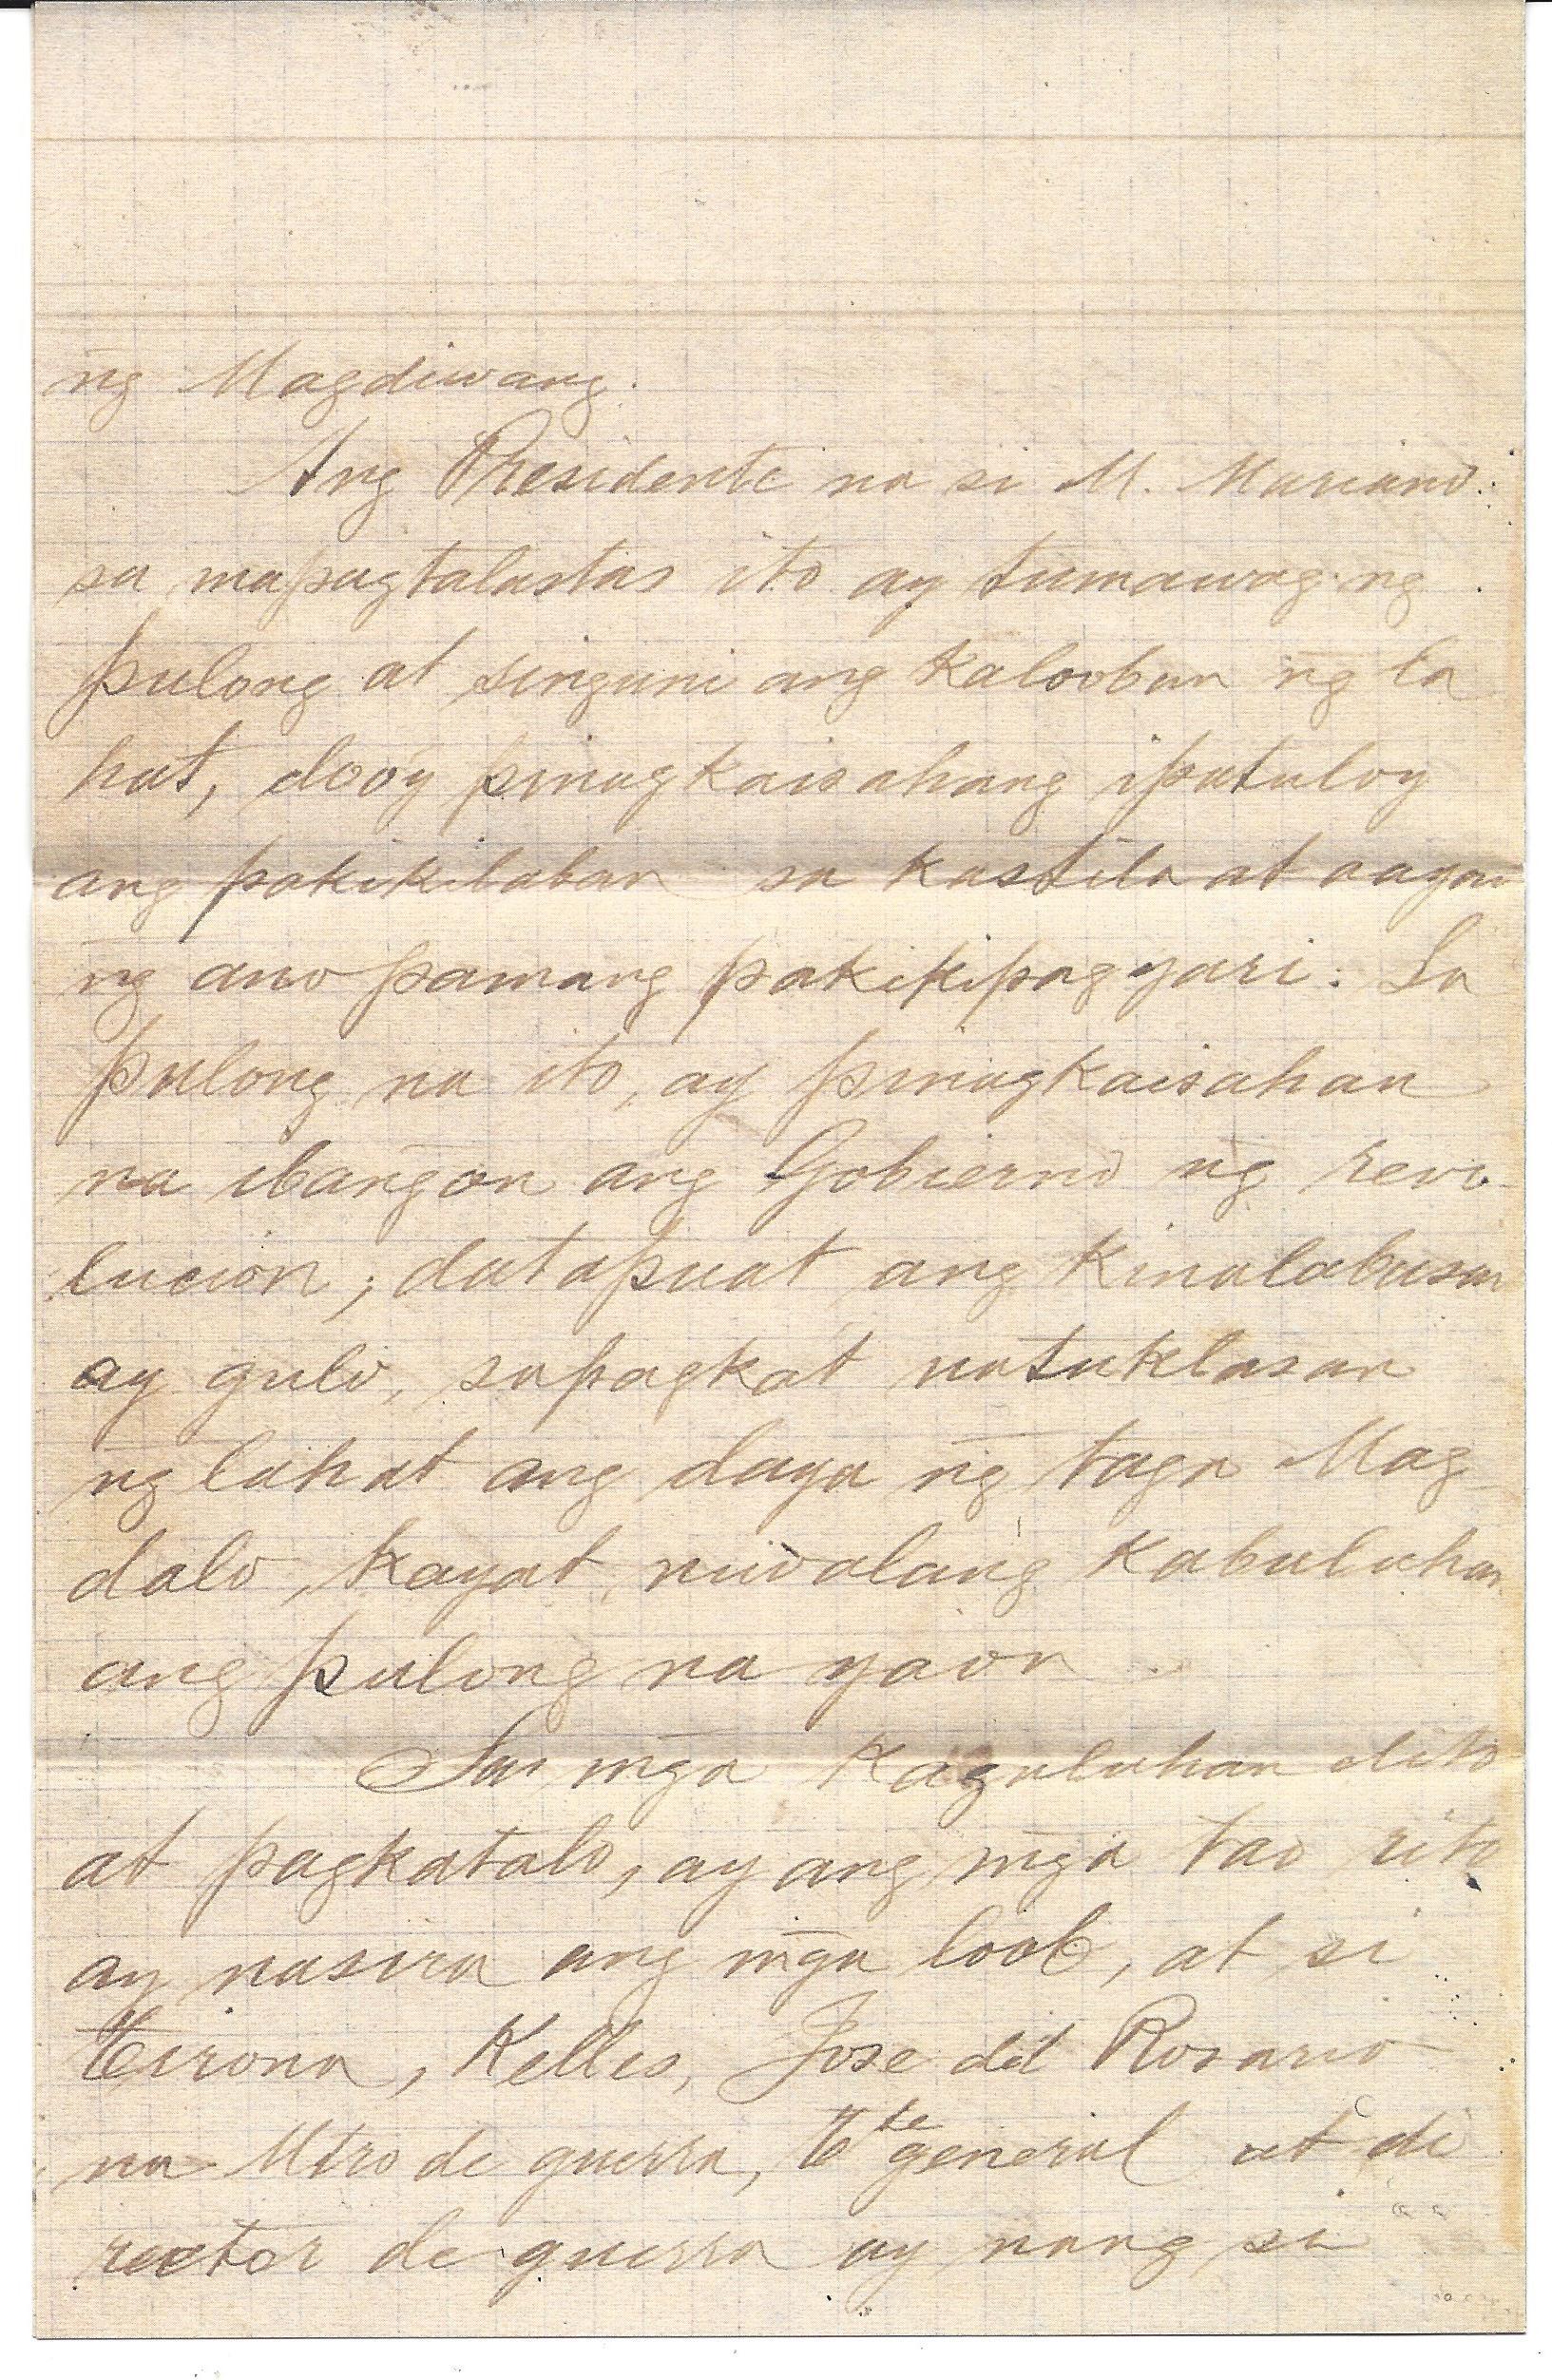 1897-04-16 Bonifacio to Jacinto page 4